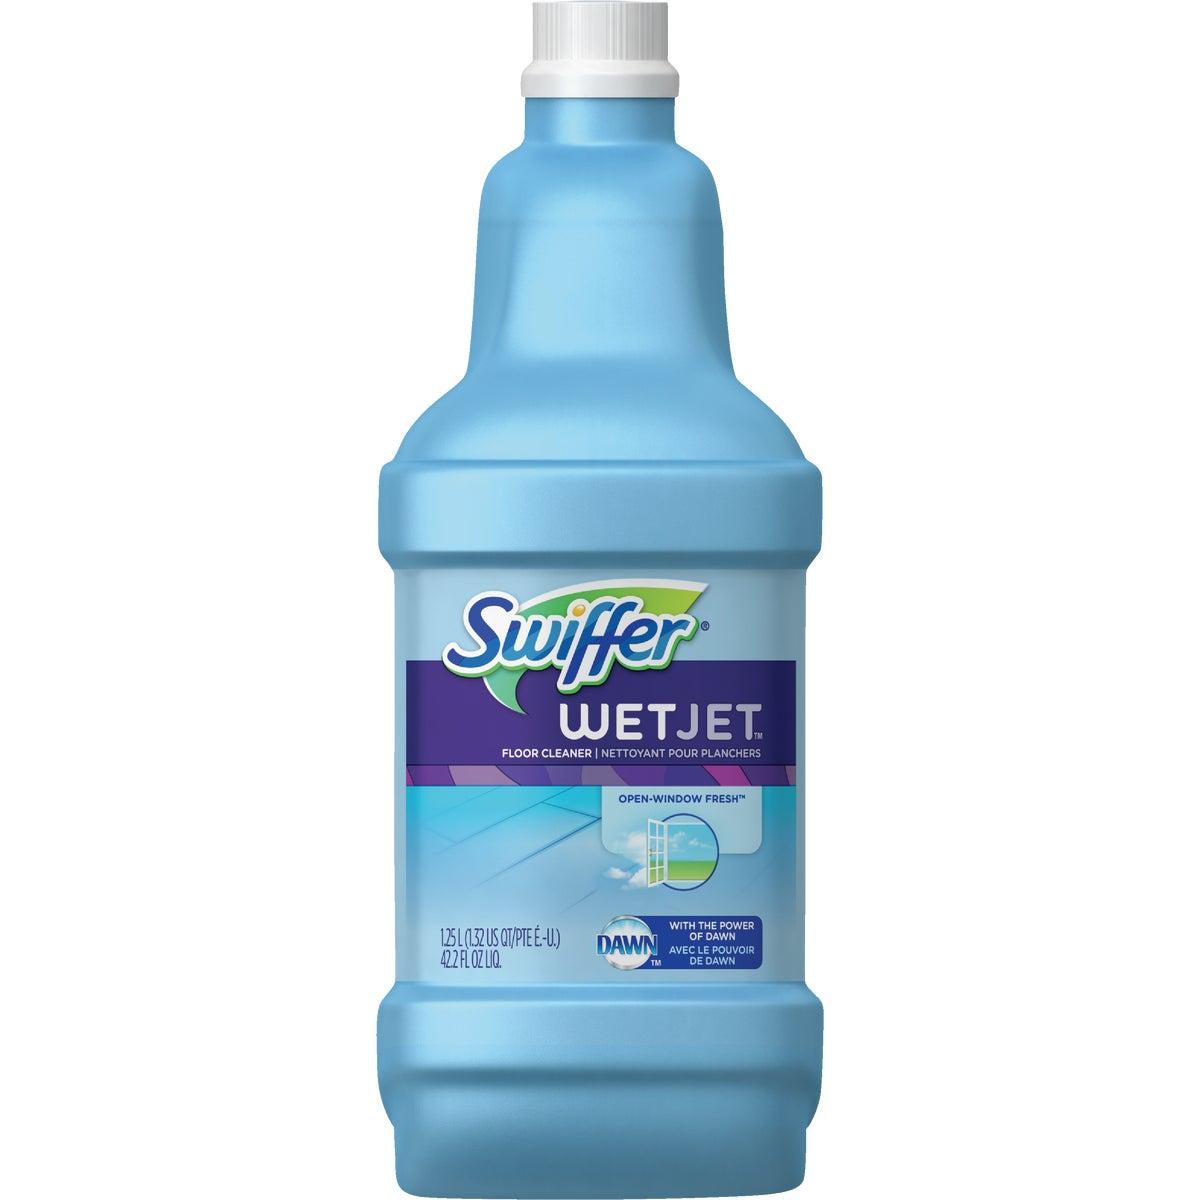 MultiPurpose WetJet Cleaner